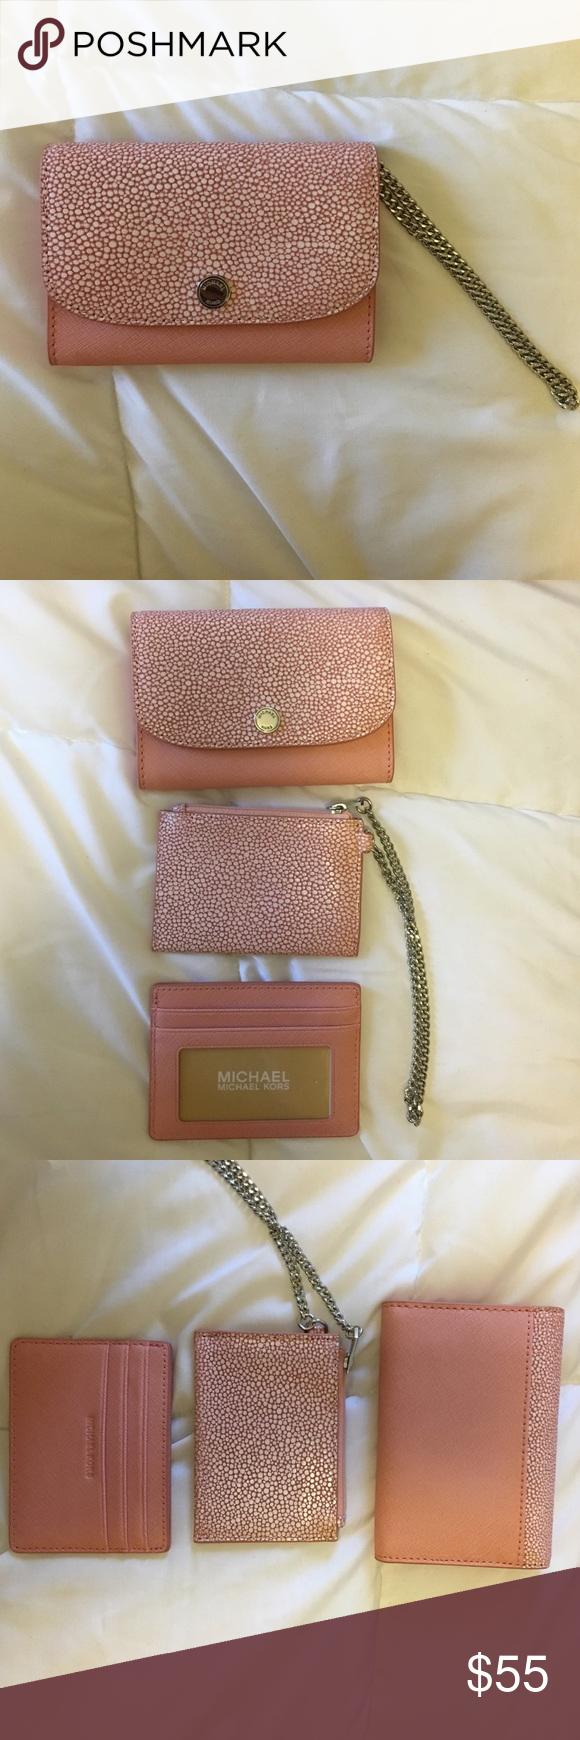 c4f3423fdc3b Michael Kors Juliana Medium 3-in-1 Flap Wallet Michael Kors Juliana Medium 3-in-1  Flap Wallet Pale Pink Michael Kors Bags Wallets